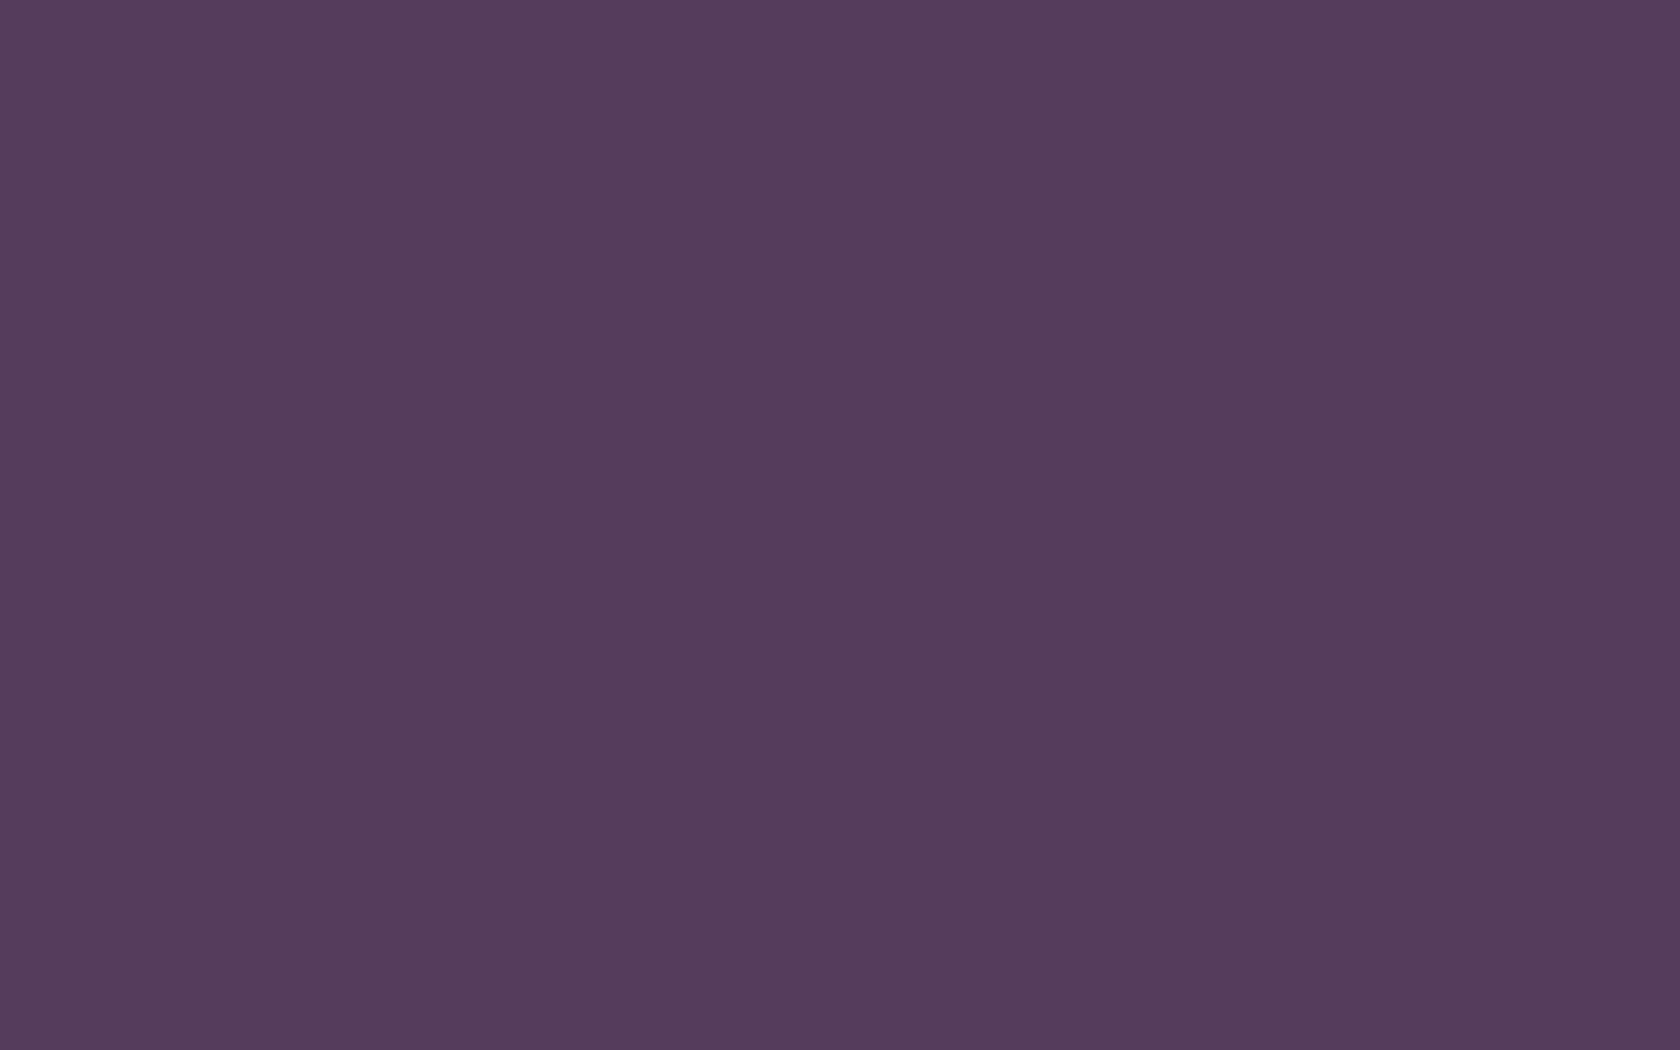 1680x1050 English Violet Solid Color Background